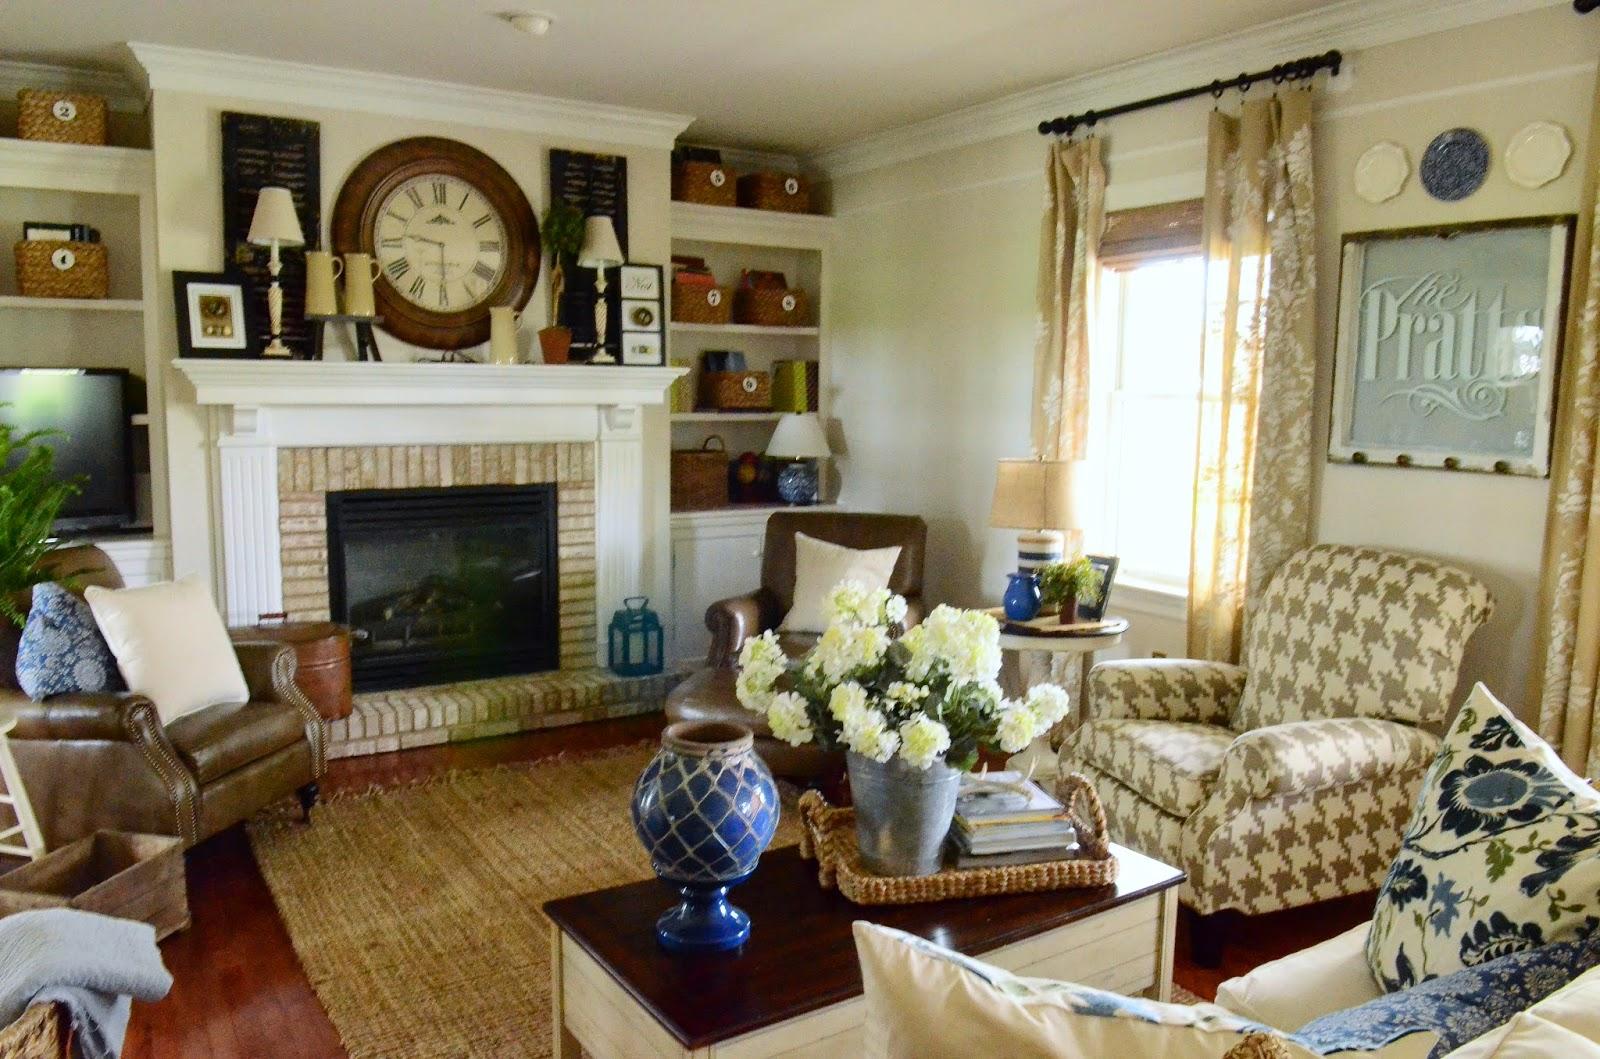 family room chair reveal - stonegable